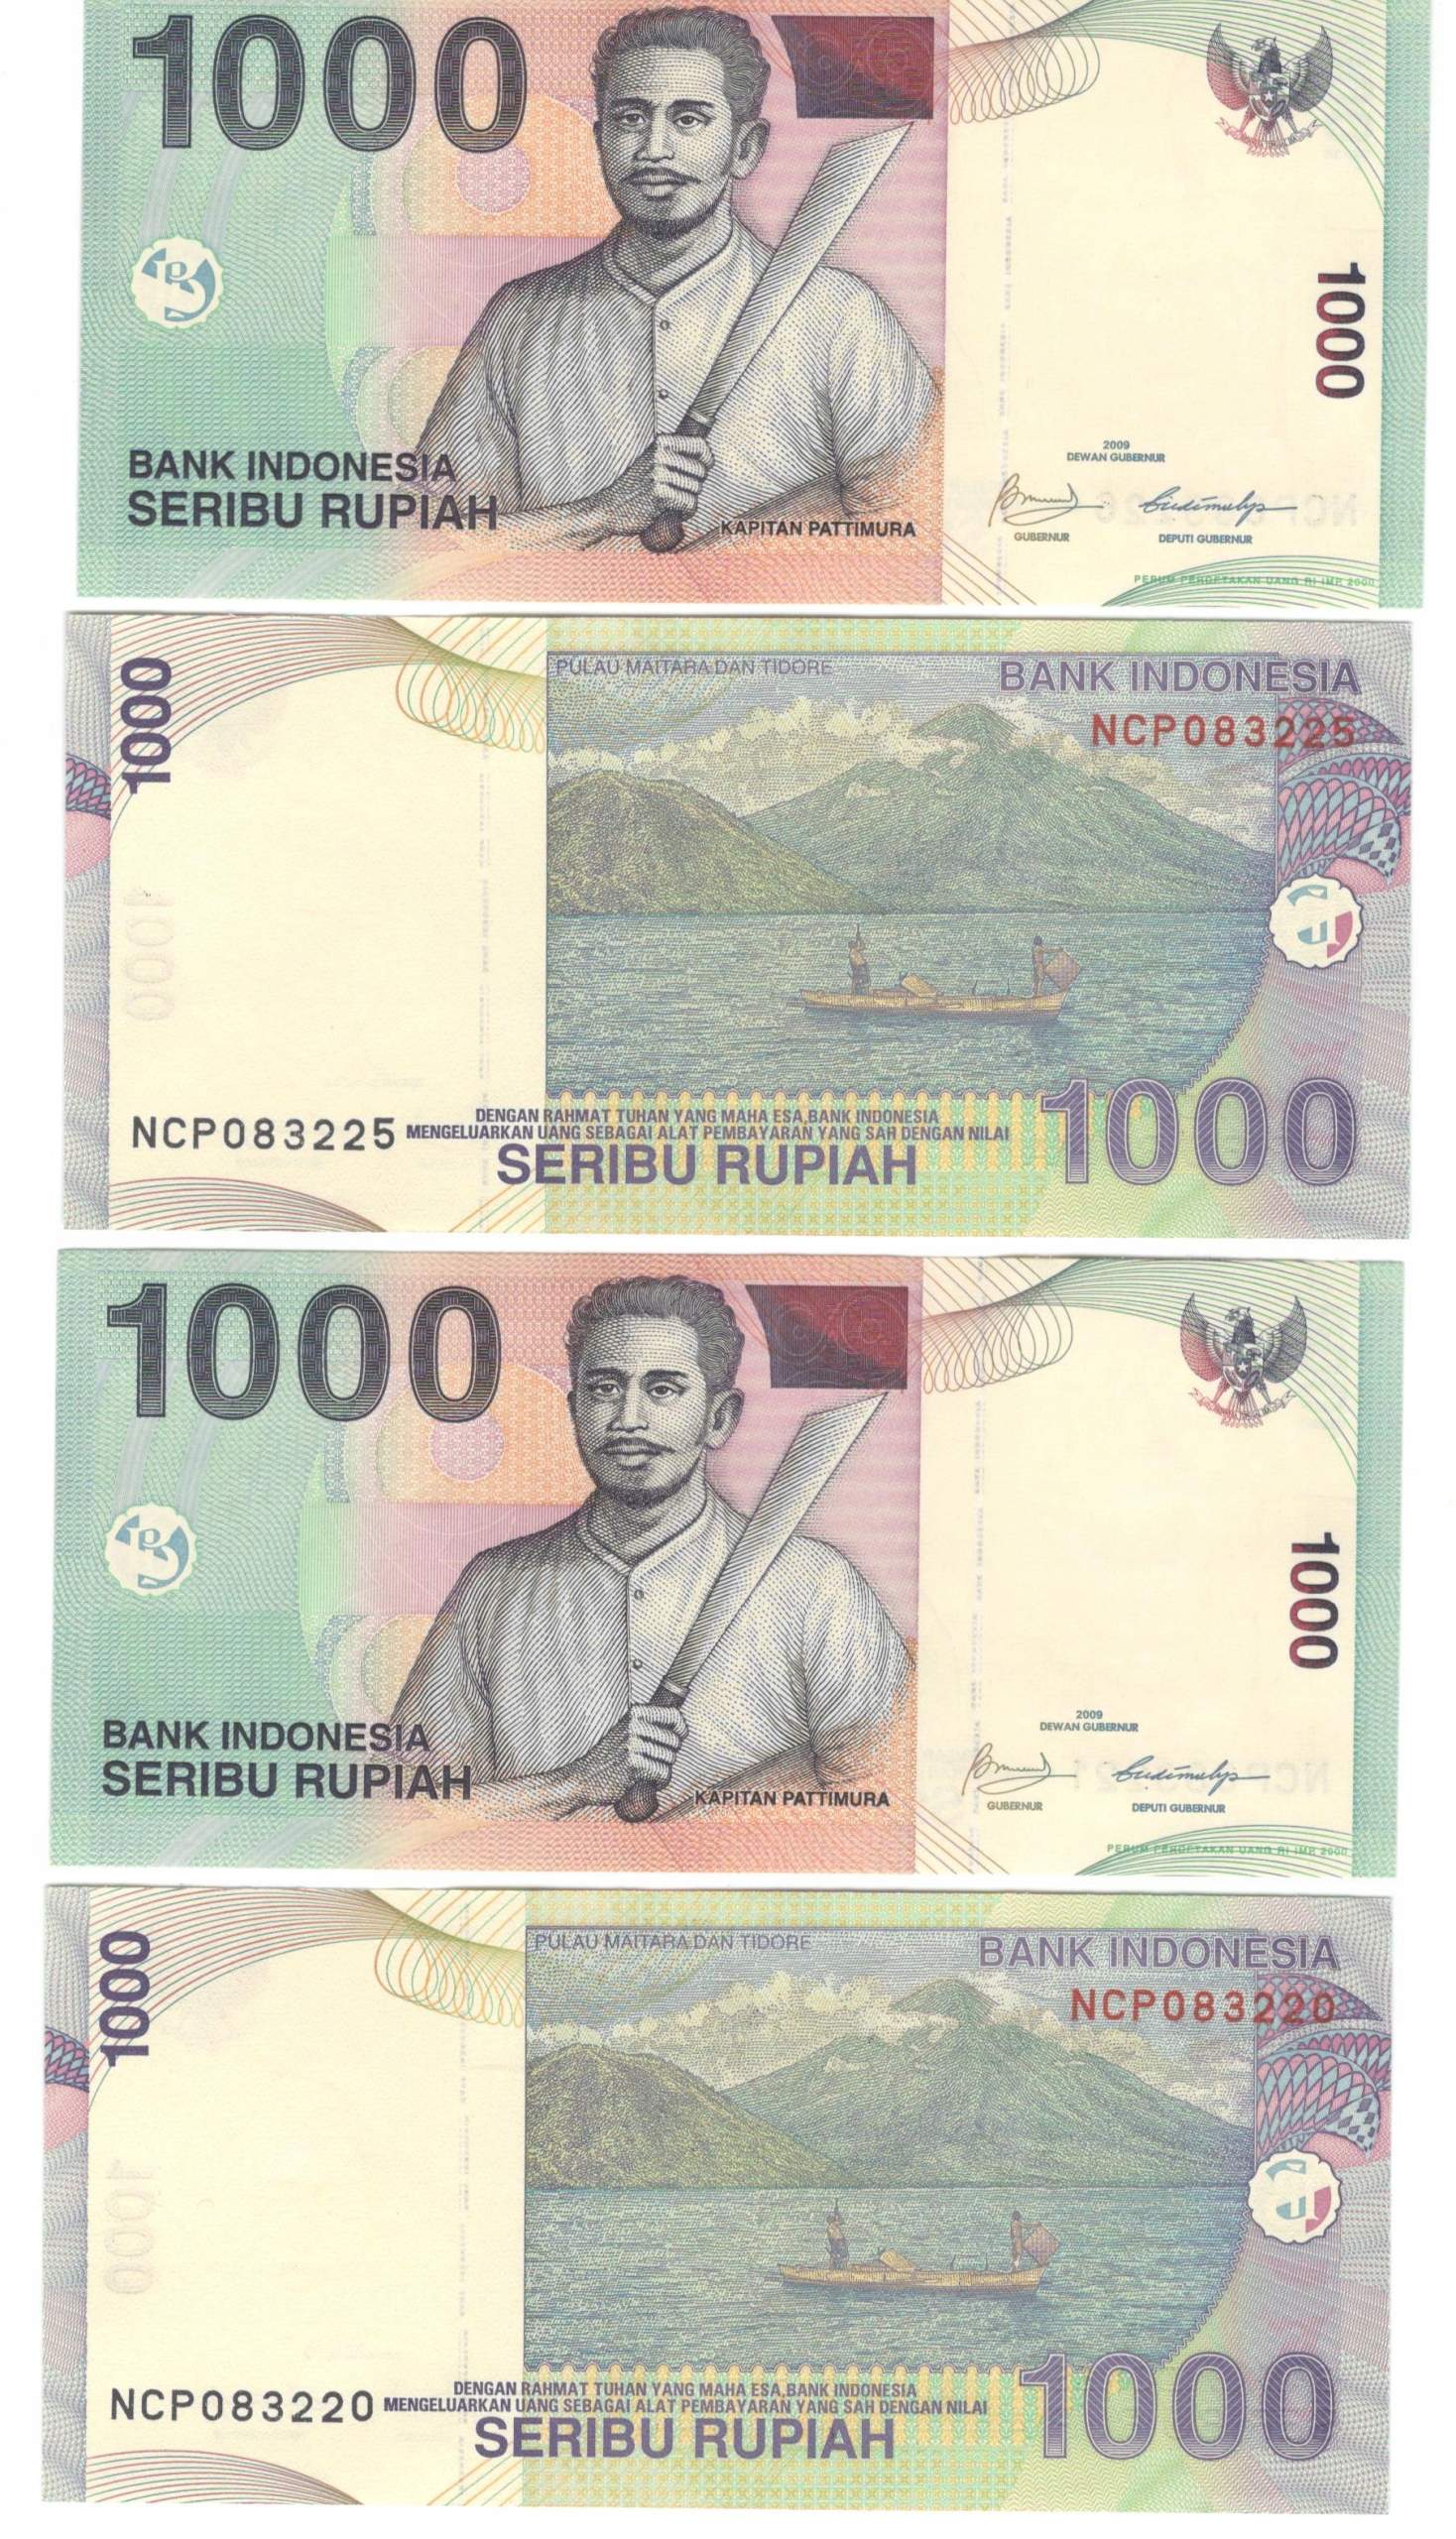 ИНДОНЕЗИЯ - 1000 РУП - 2009 UNC